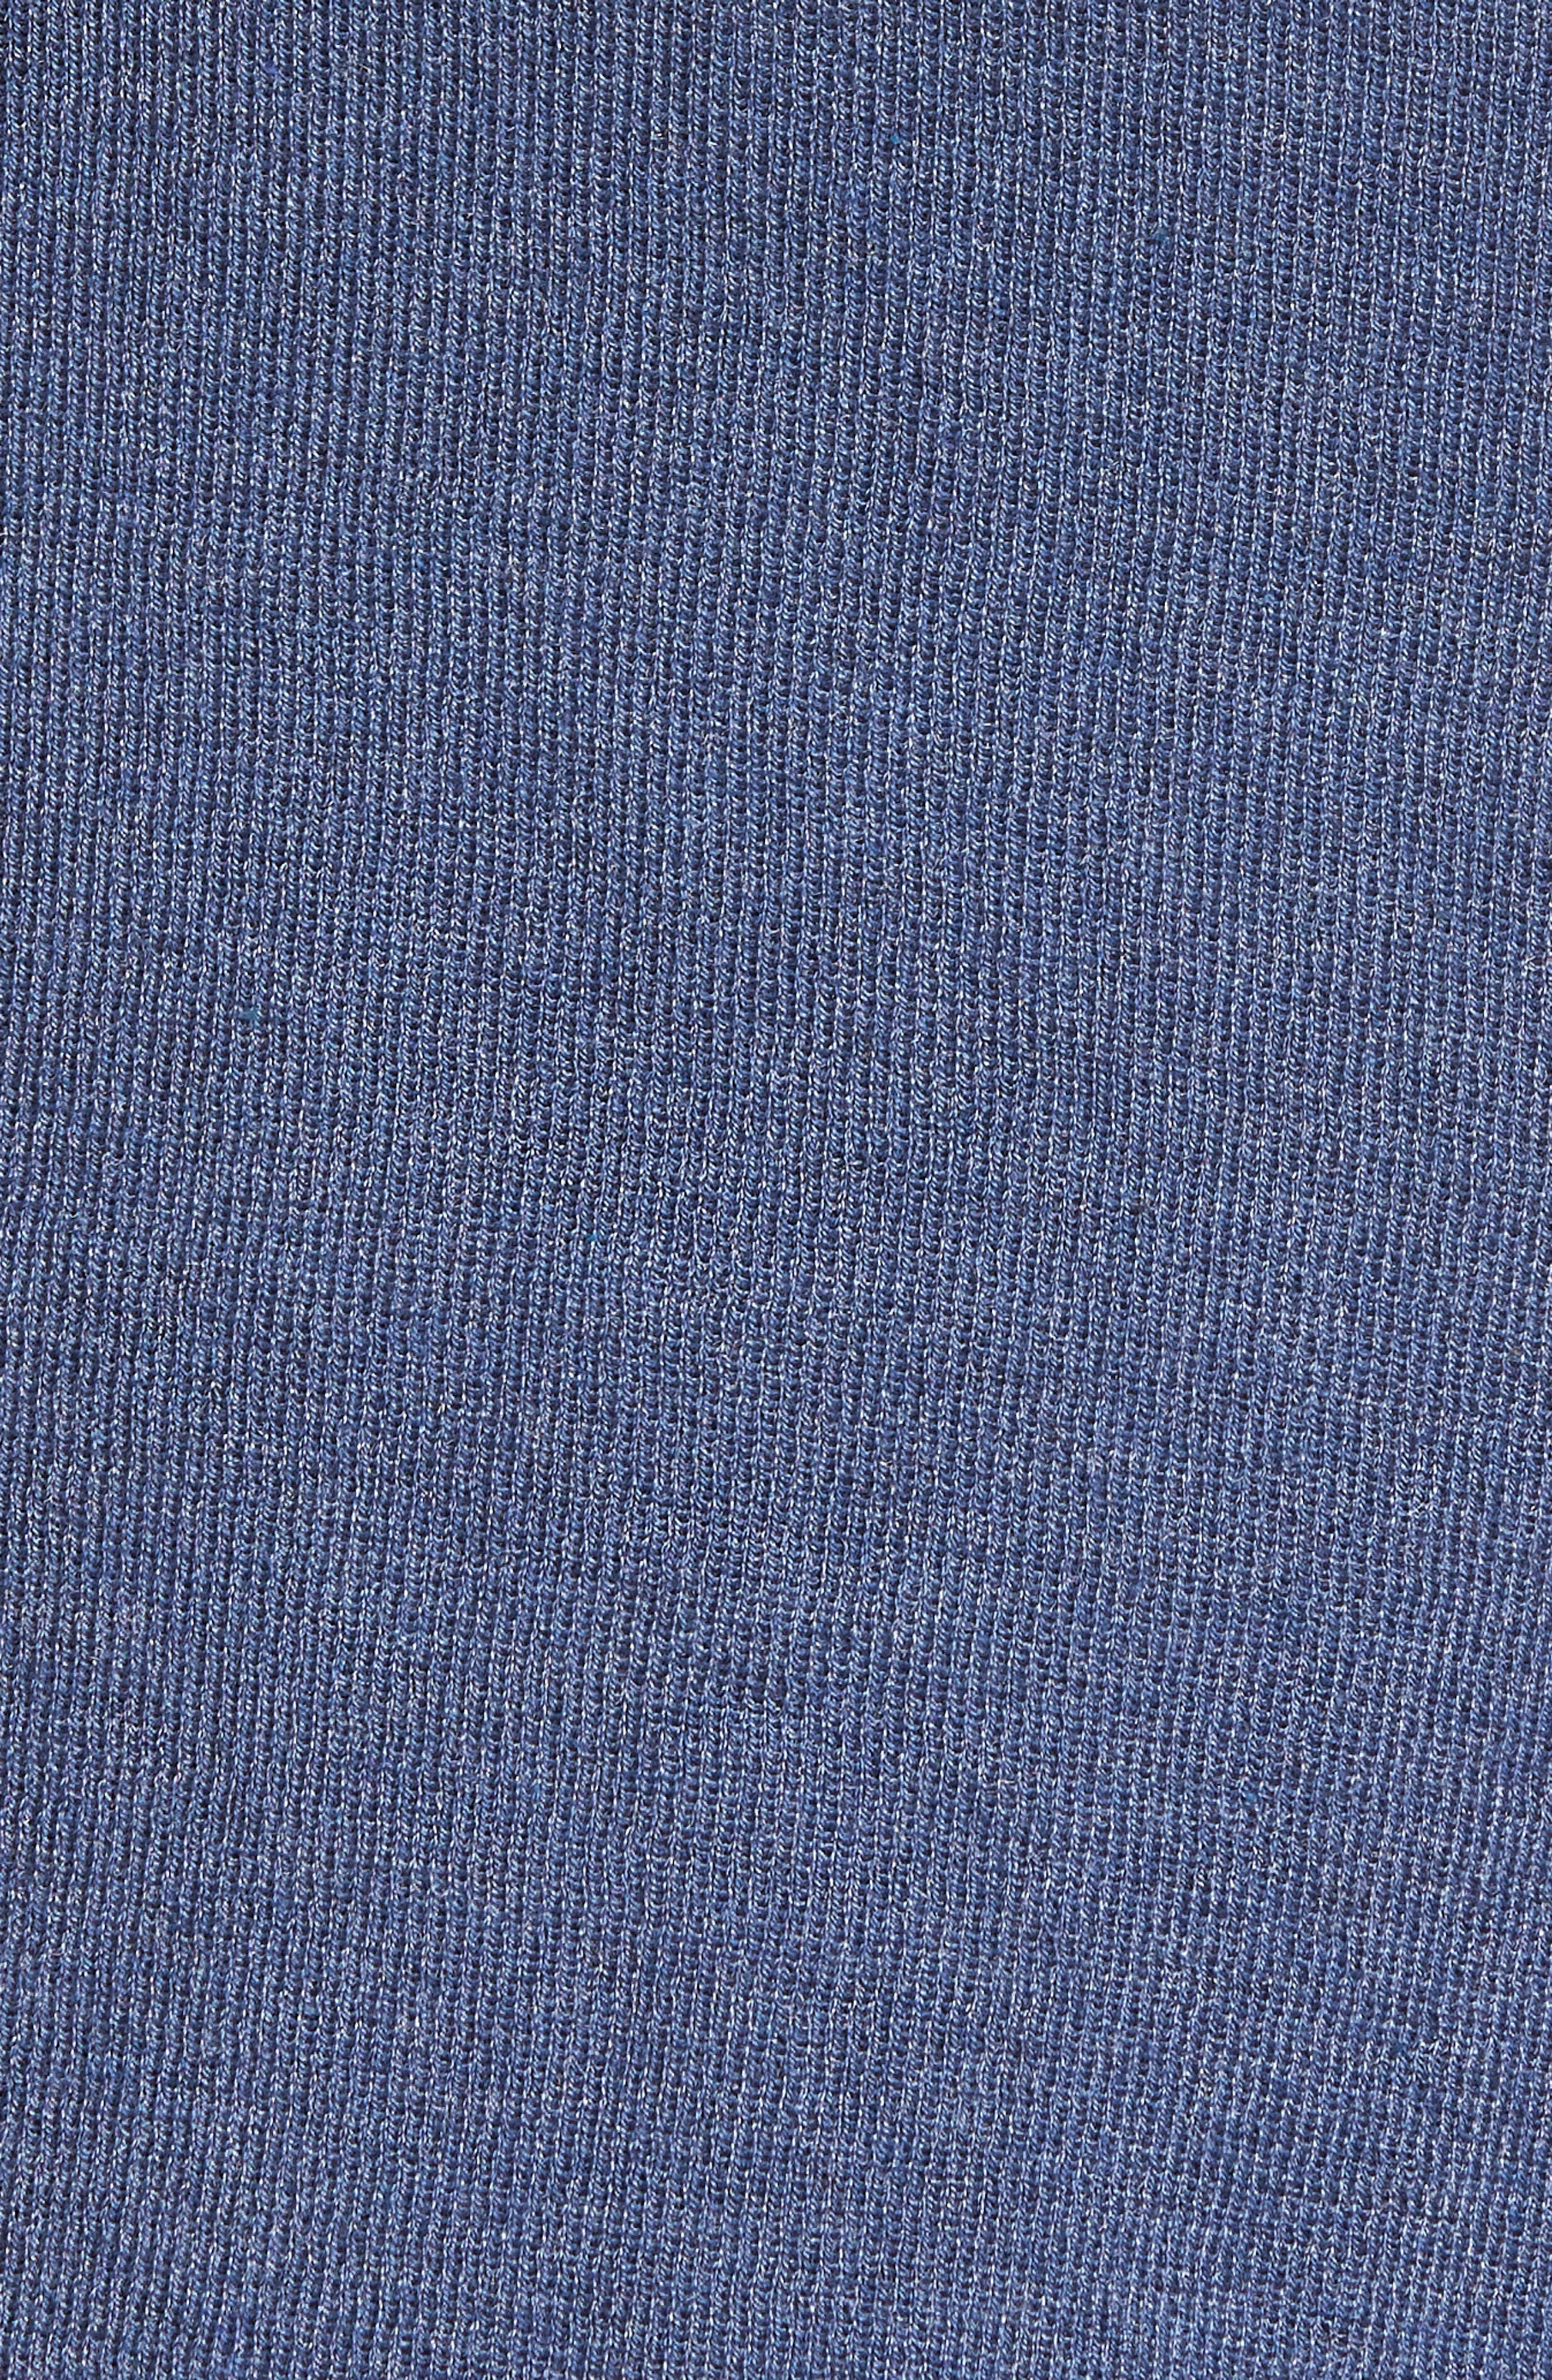 4-Way Convertible Three Quarter Sleeve Cardigan,                             Alternate thumbnail 6, color,                             Faded Navy